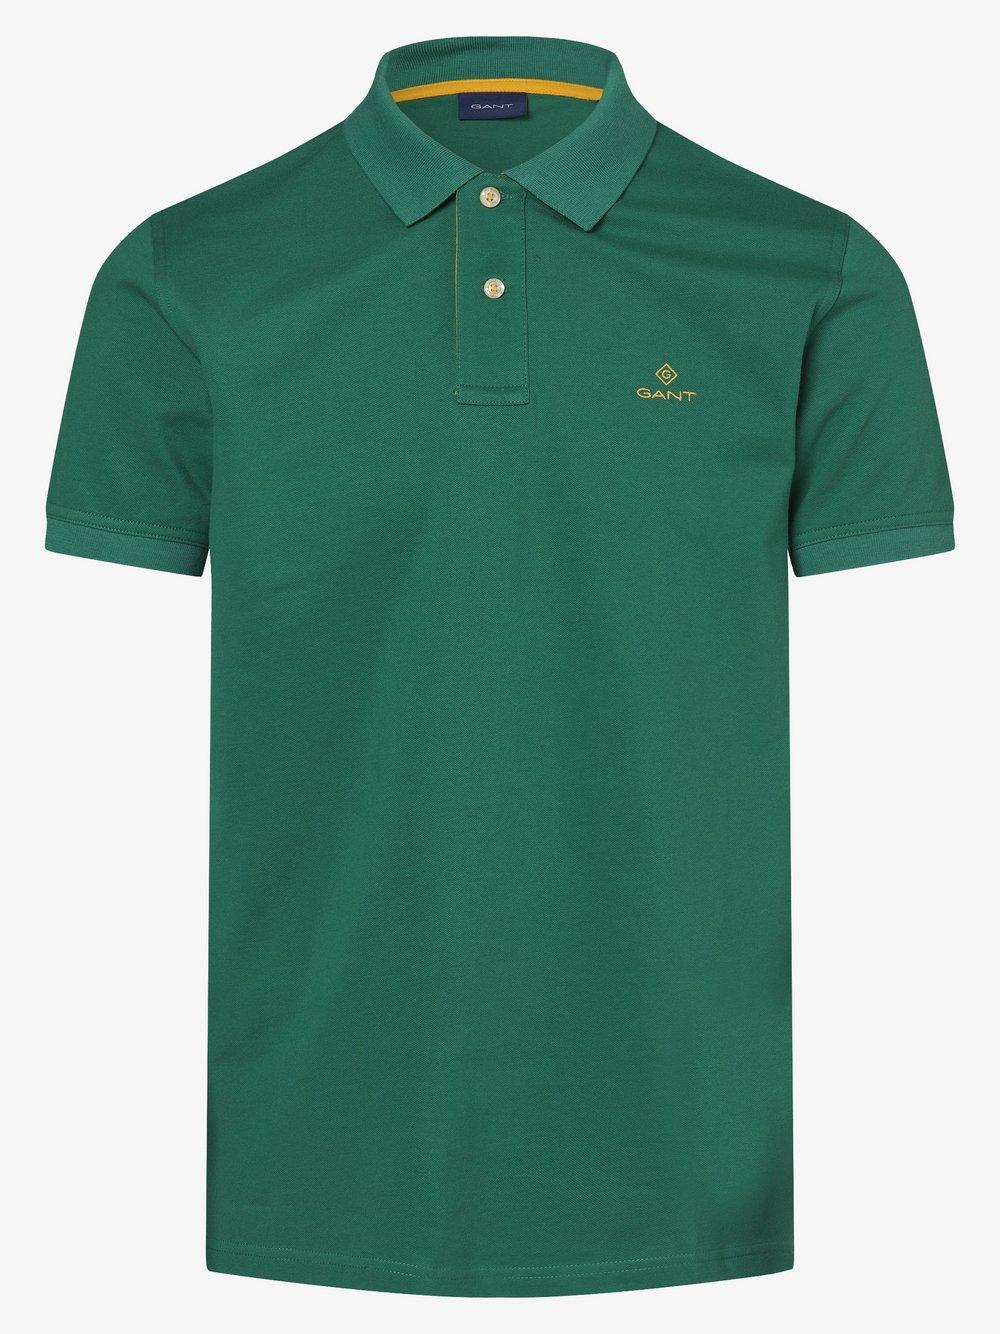 Gant - Męska koszulka polo, zielony